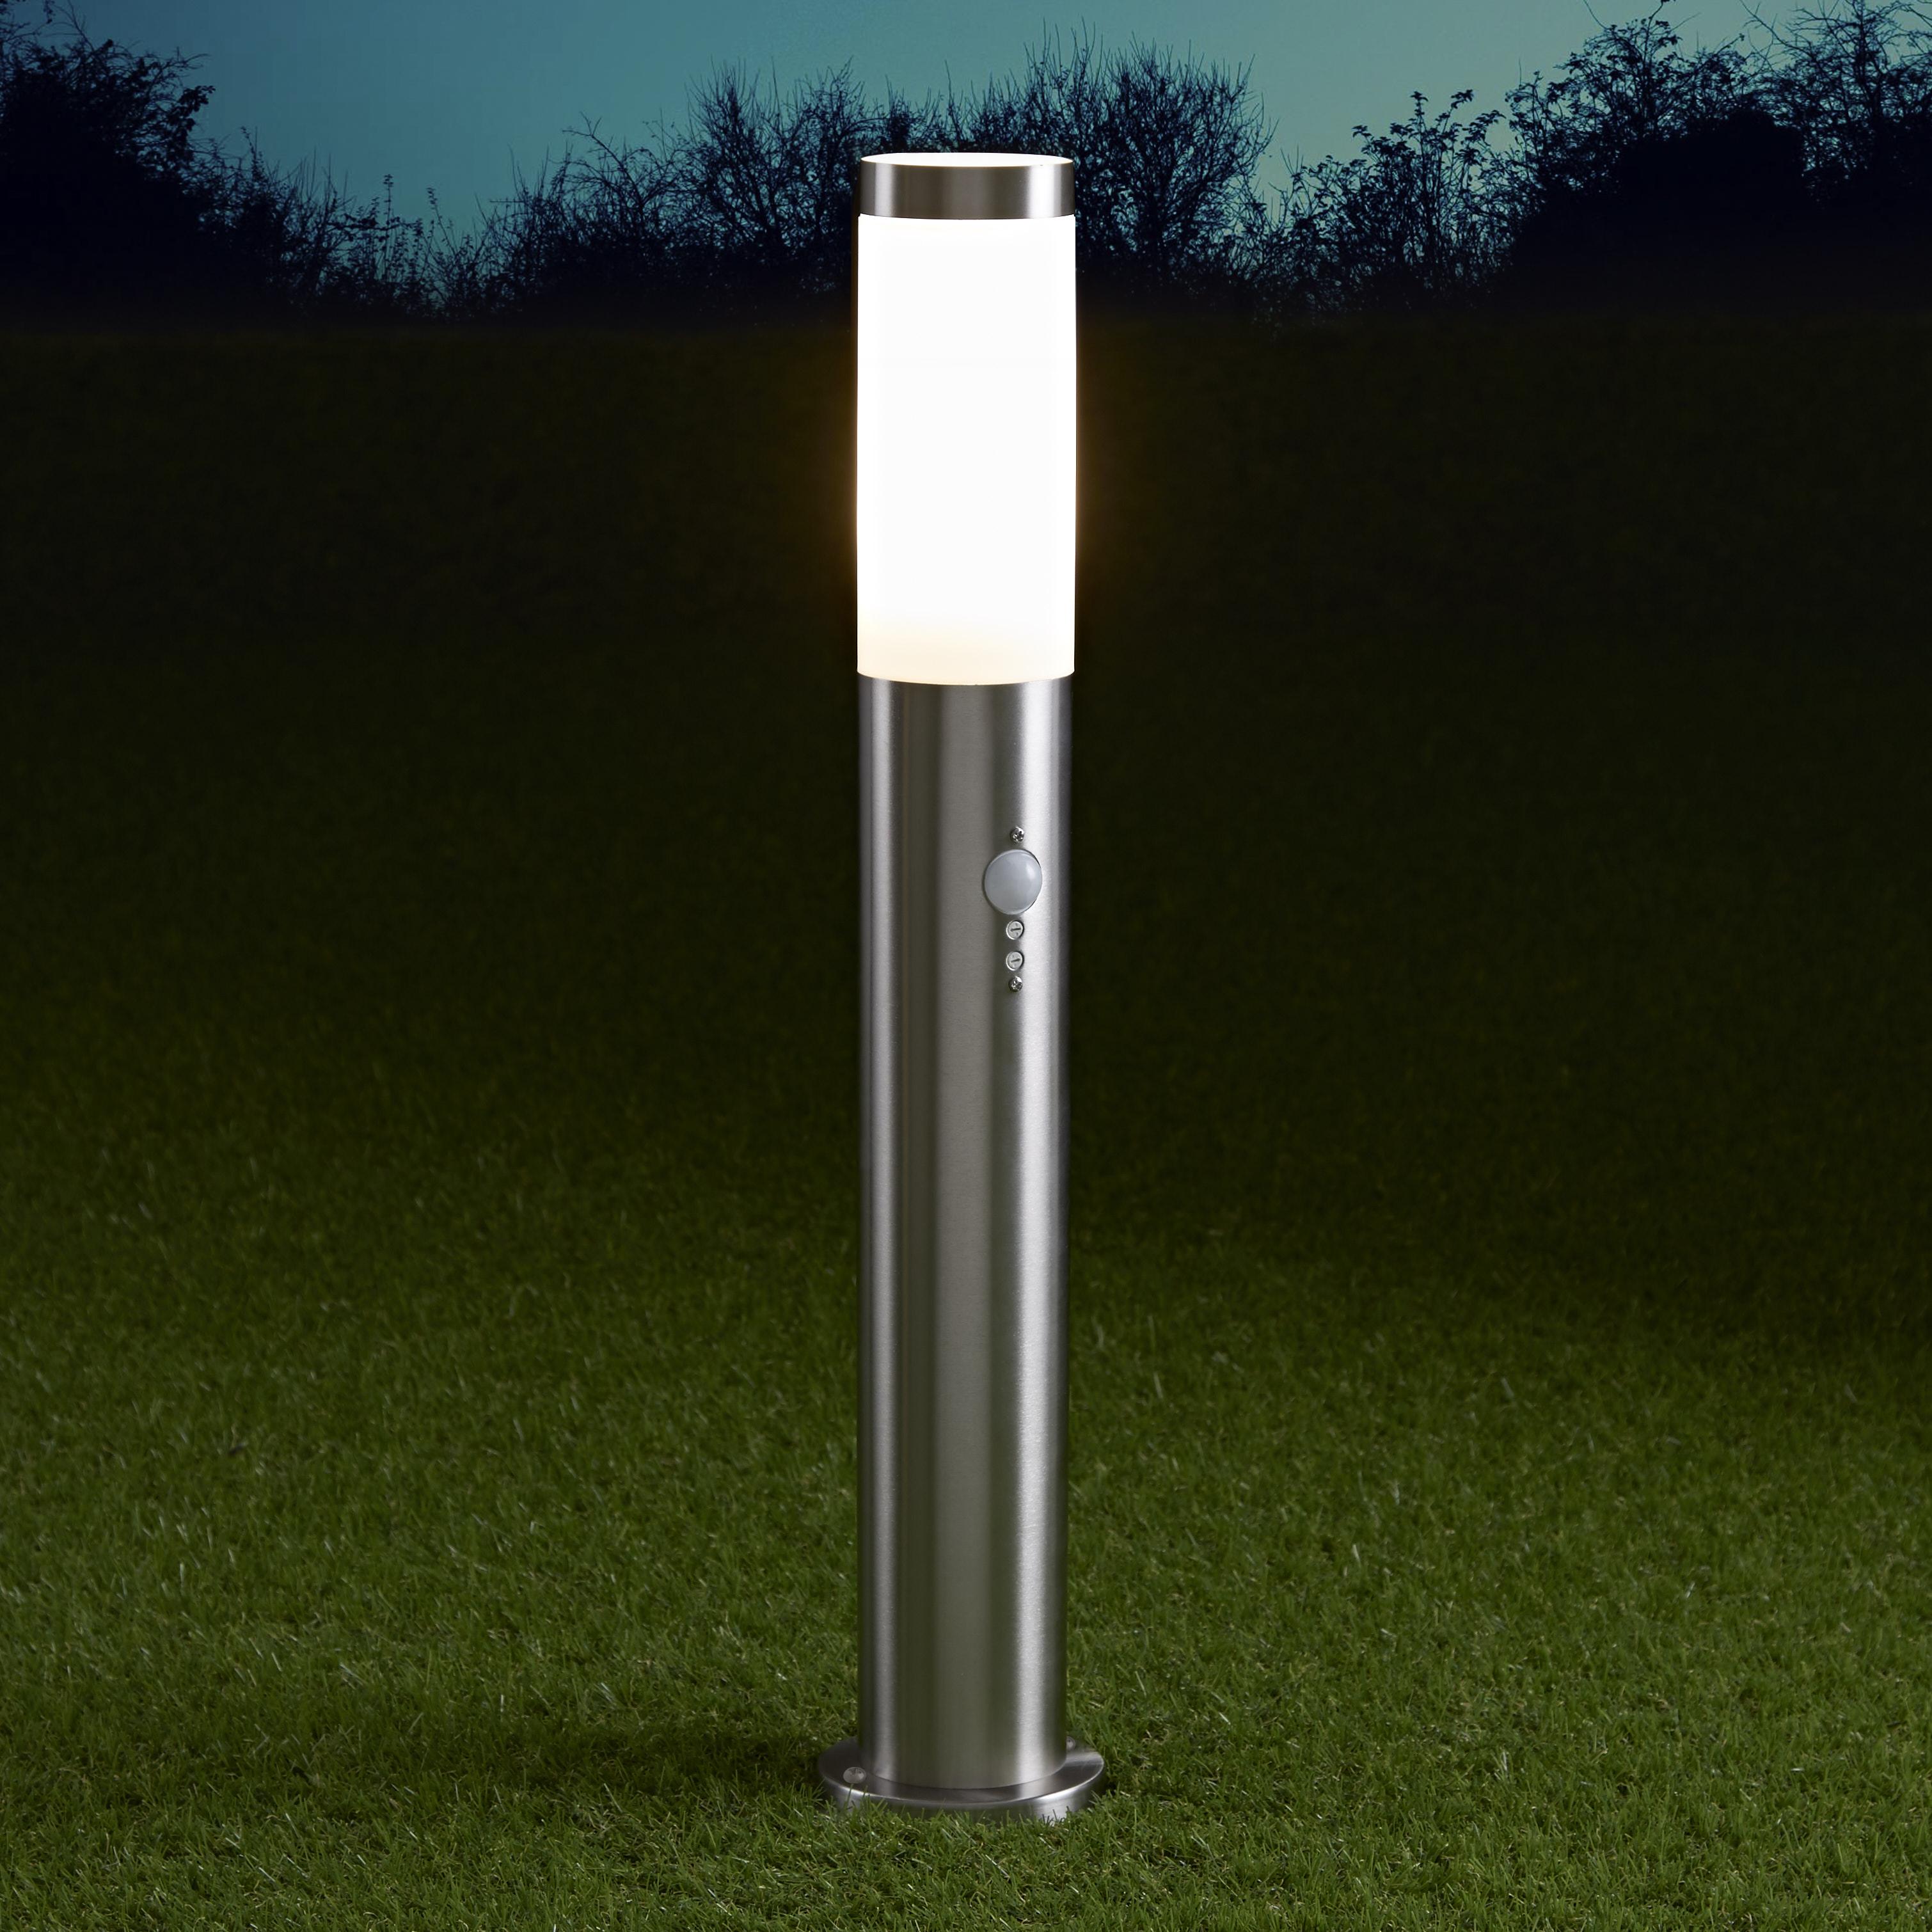 Biard Le Mans Sokkellamp RVS PIR Sensor 60cm Hoog E27 / IP44